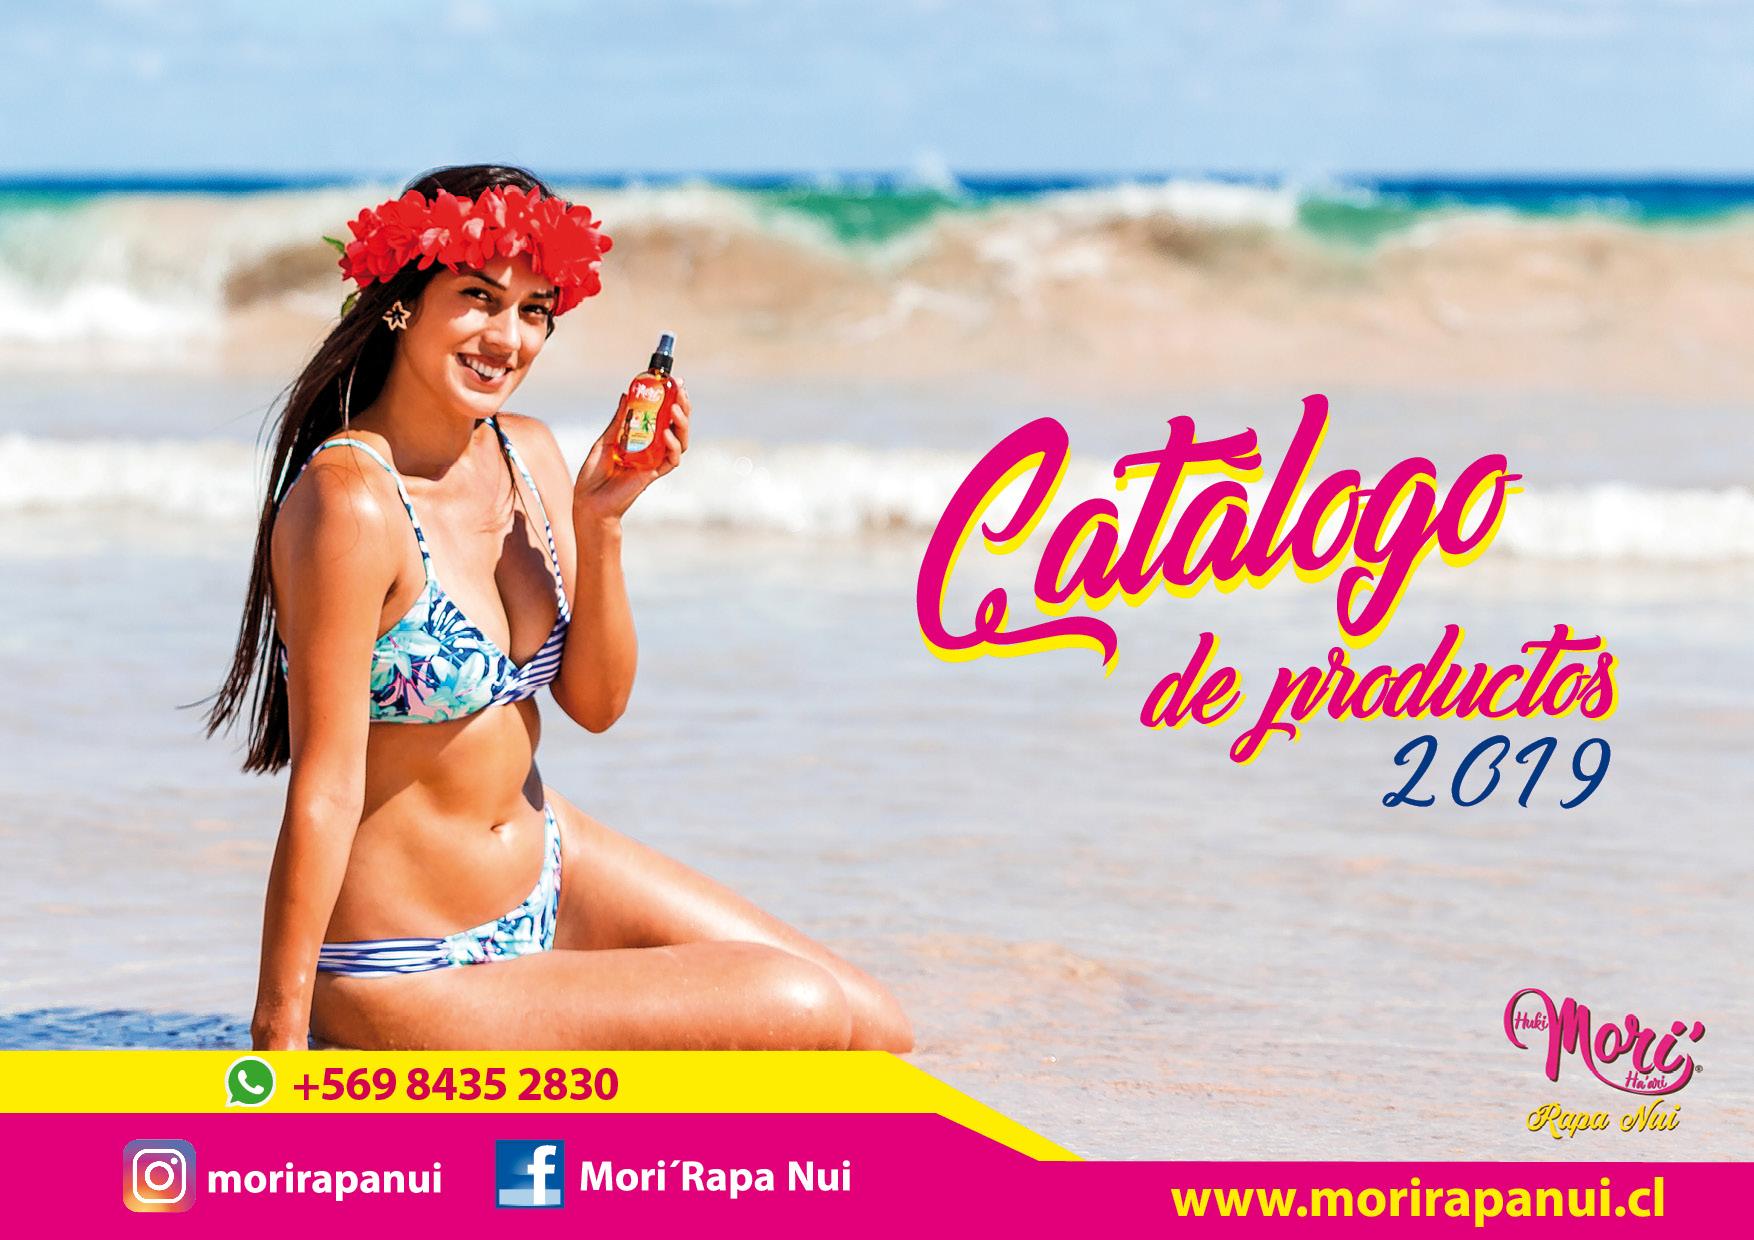 Mori Rapa Nui - Catalogo 2019 - 01